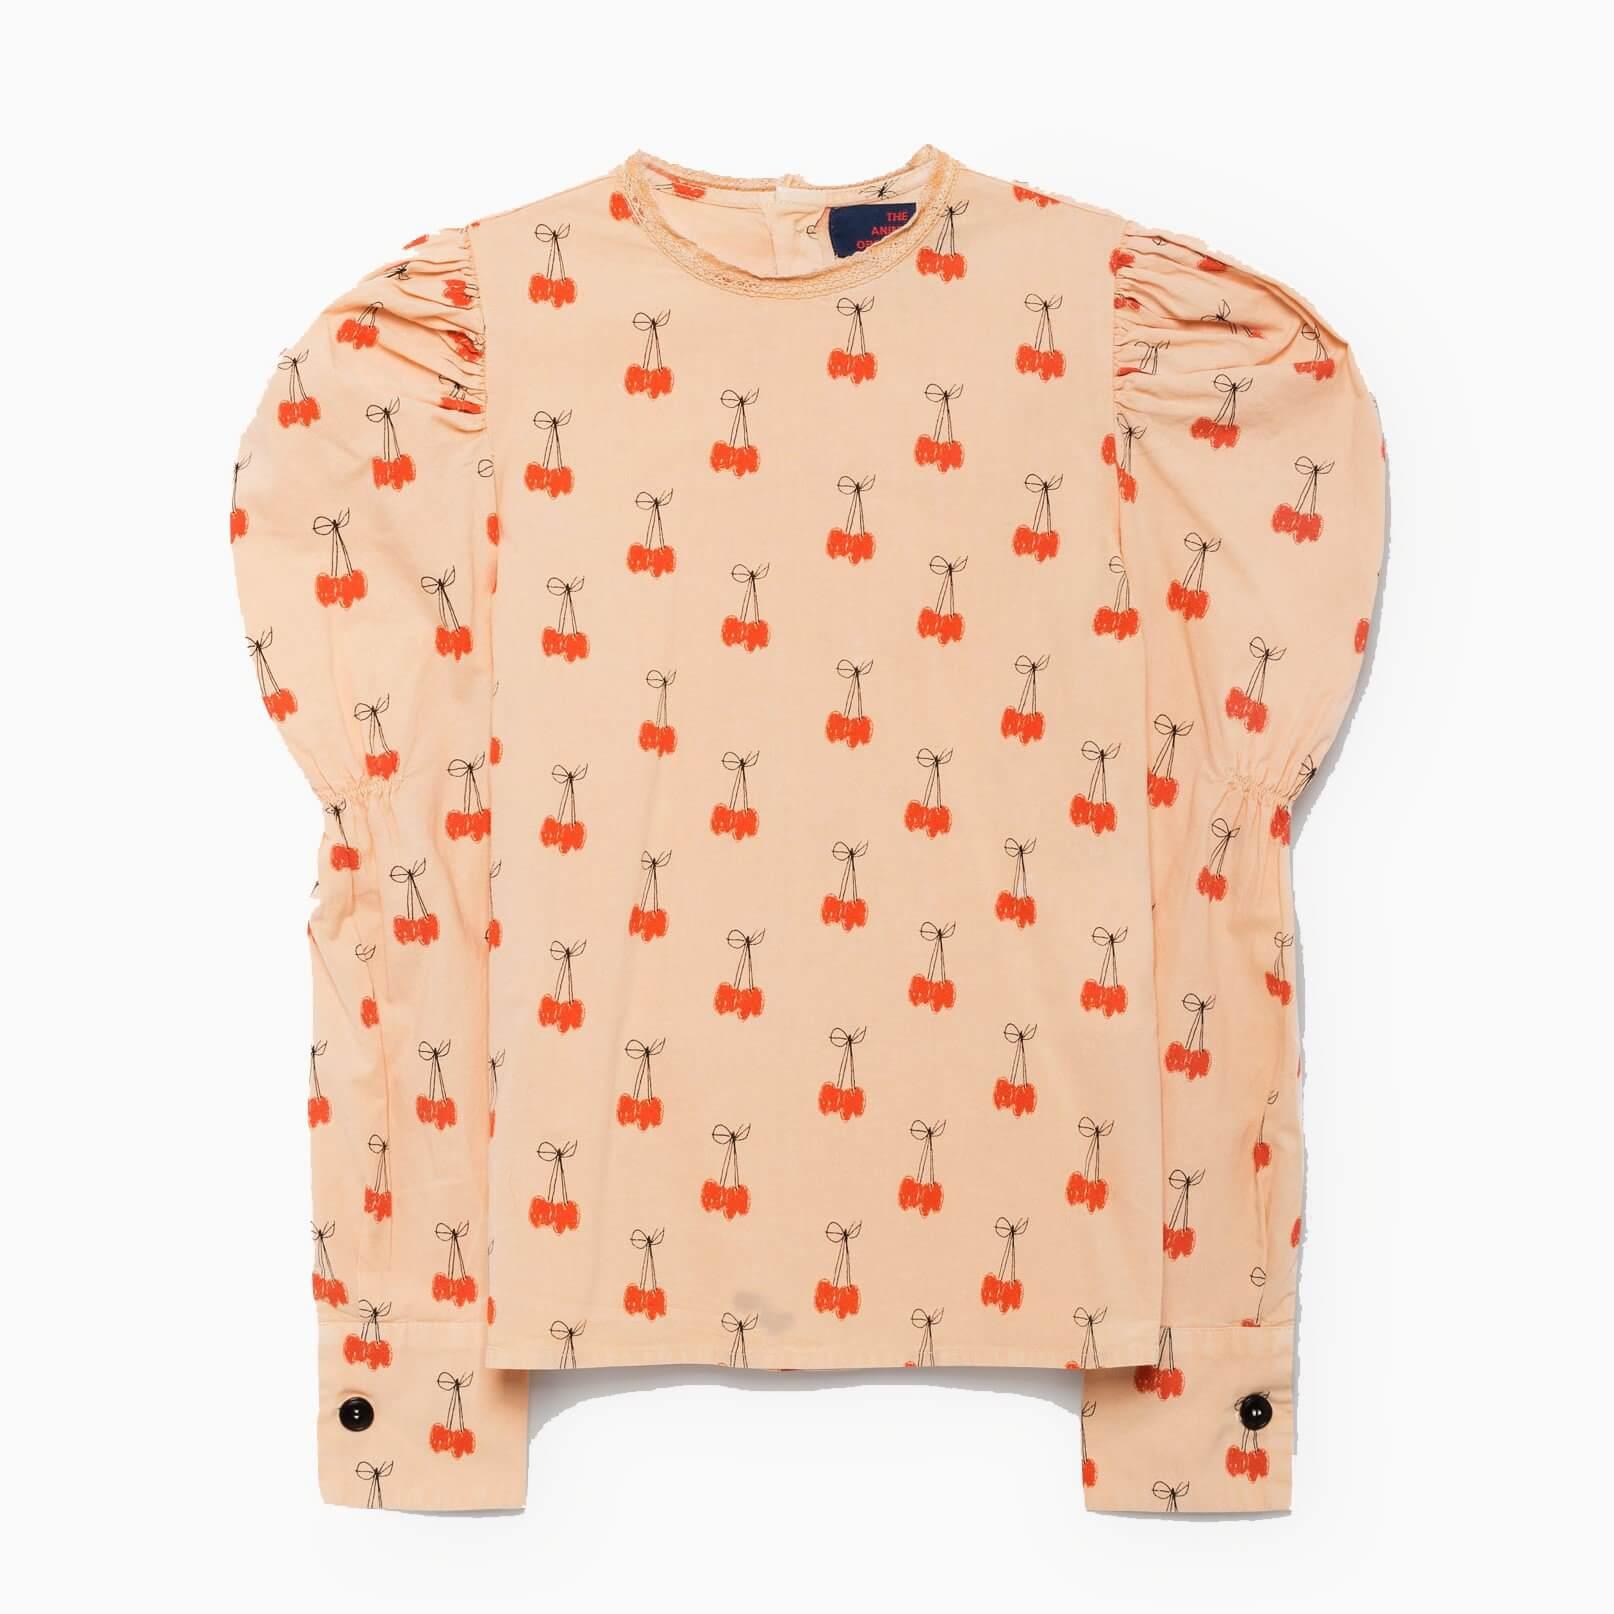 THE ANIMALS OBSERVATORY Flamingo-shirt Kirschen